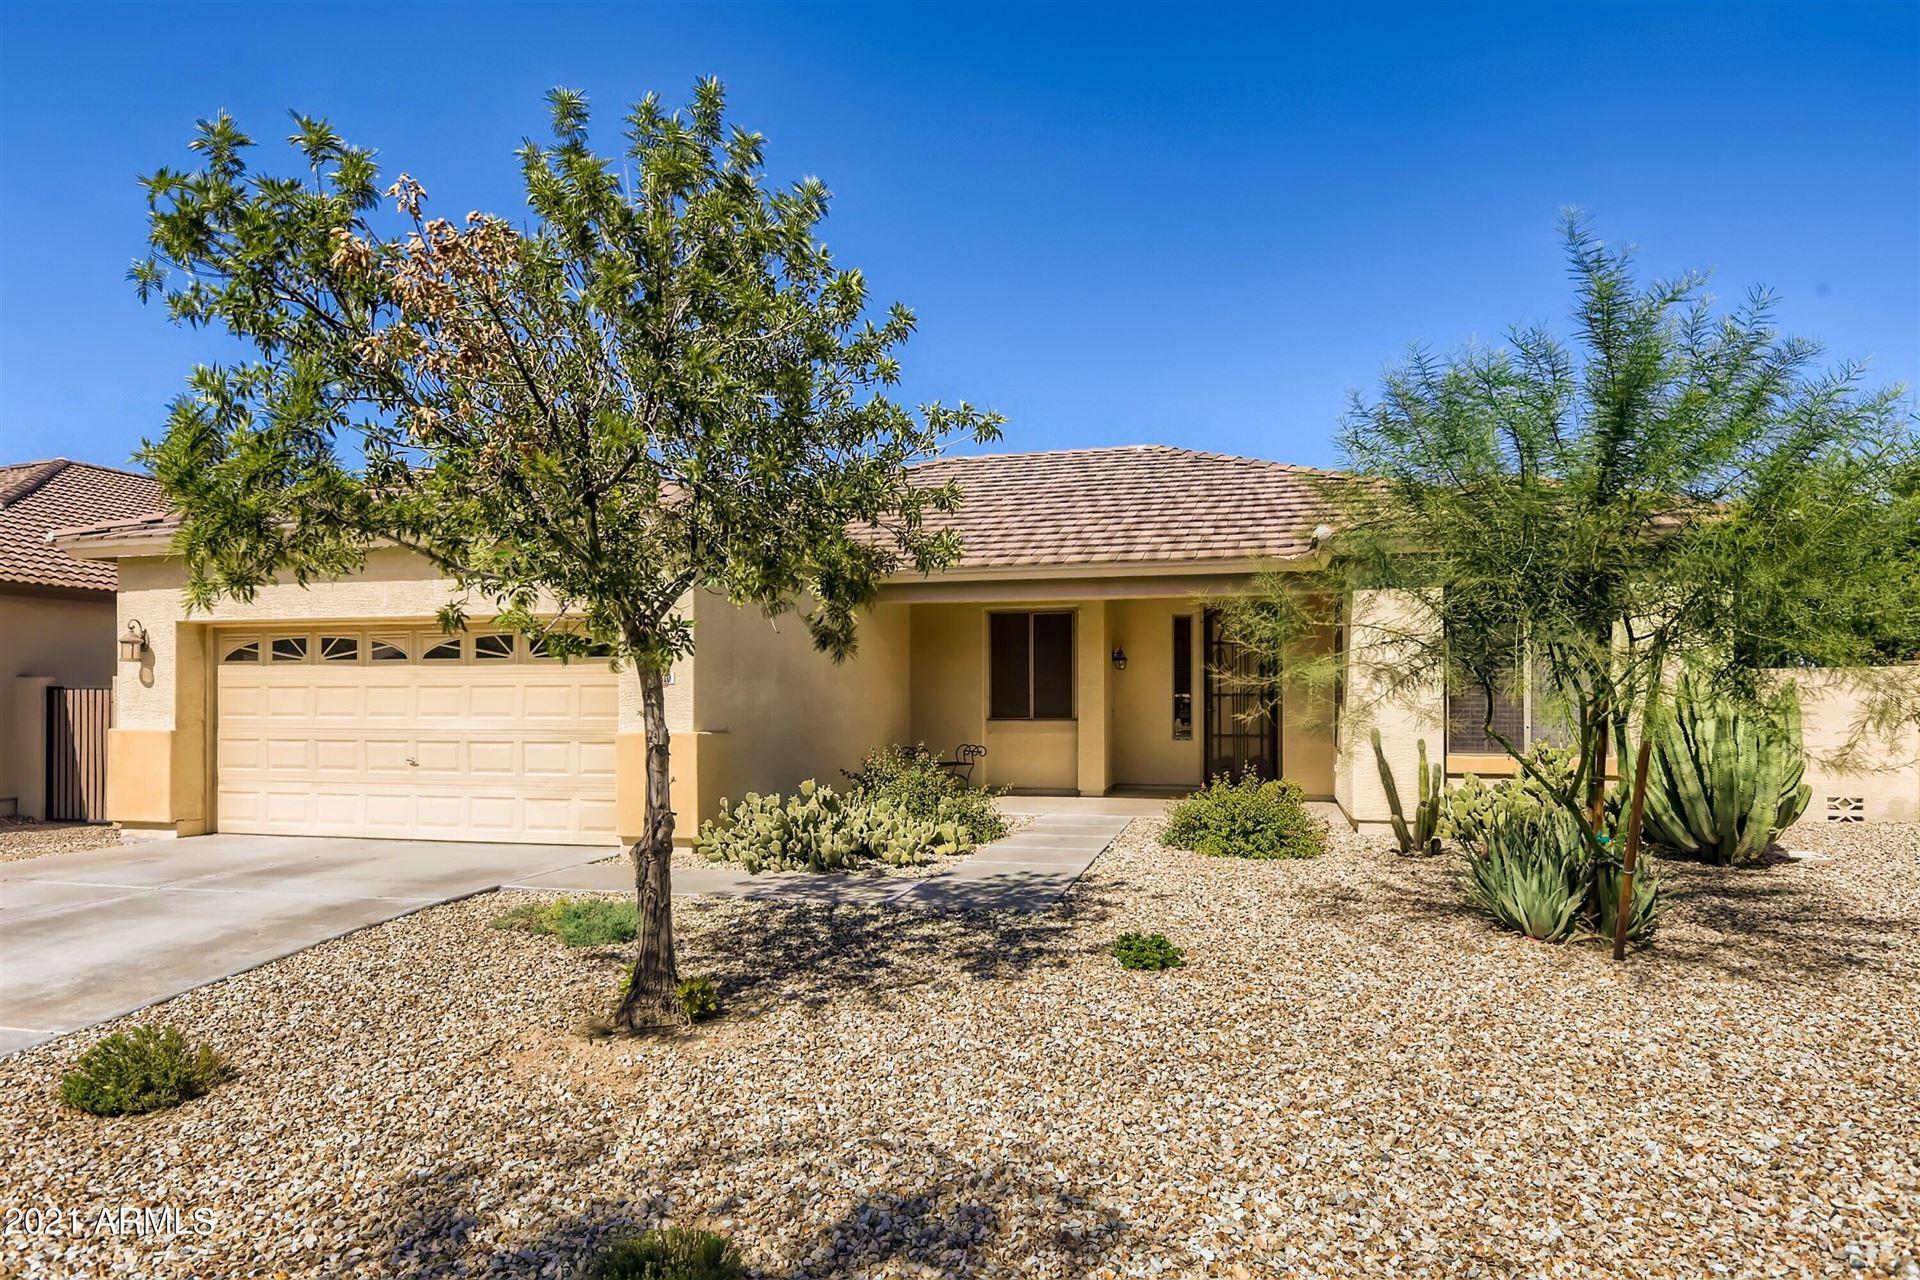 1810 E VALENCIA Drive, Phoenix, AZ 85042 - MLS#: 6310033